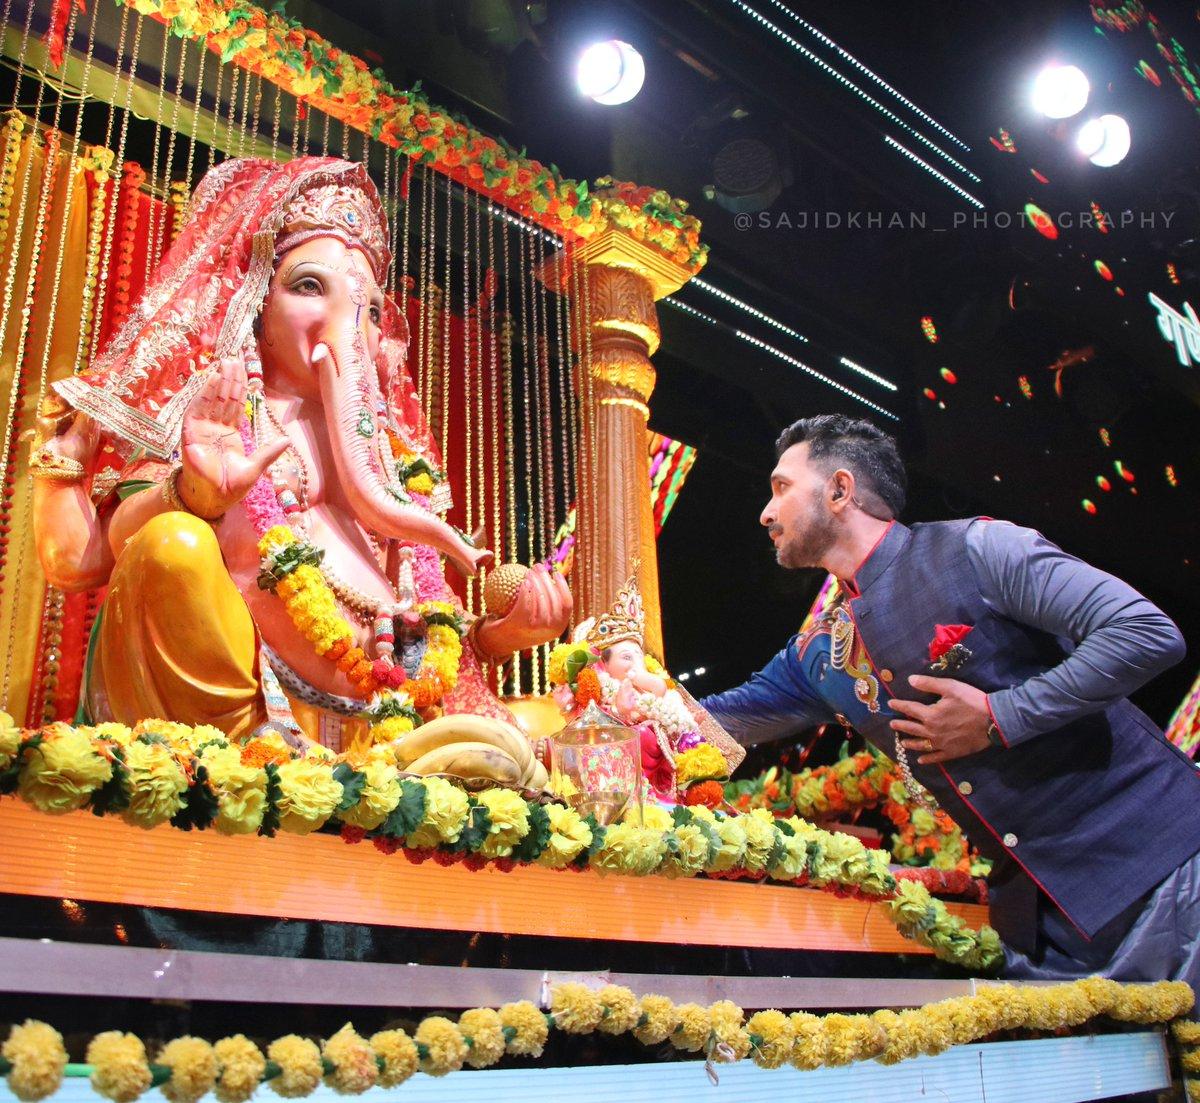 गणपती बाप्पा मोरया!! Eat ukdi modak & puran poli & Stay Safe! Ganeshji is referred to as Vighnahaara ( Remover of Obstacles) what obstacles do you wish to be removed comment below 👇   #GaneshChaturthi #GaneshChaturthi2020 #LordGanesh #GanpatiBappaMorya https://t.co/usq5eAtEiN